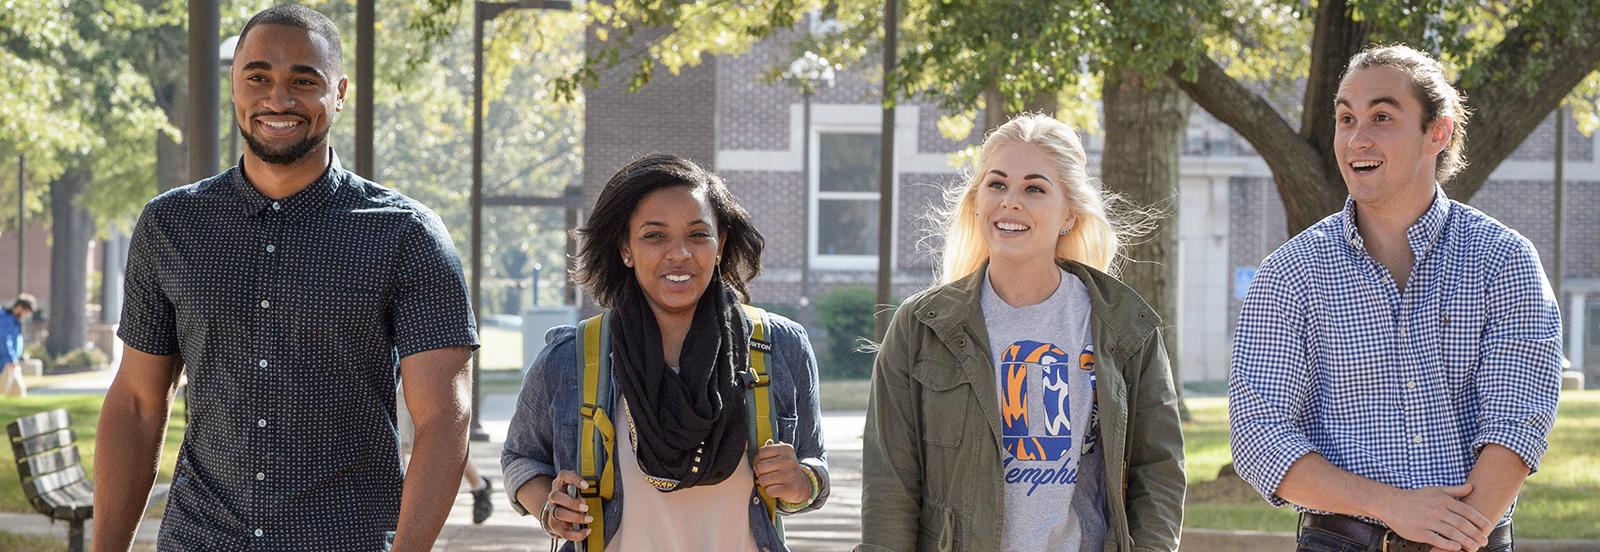 four students walking through campus